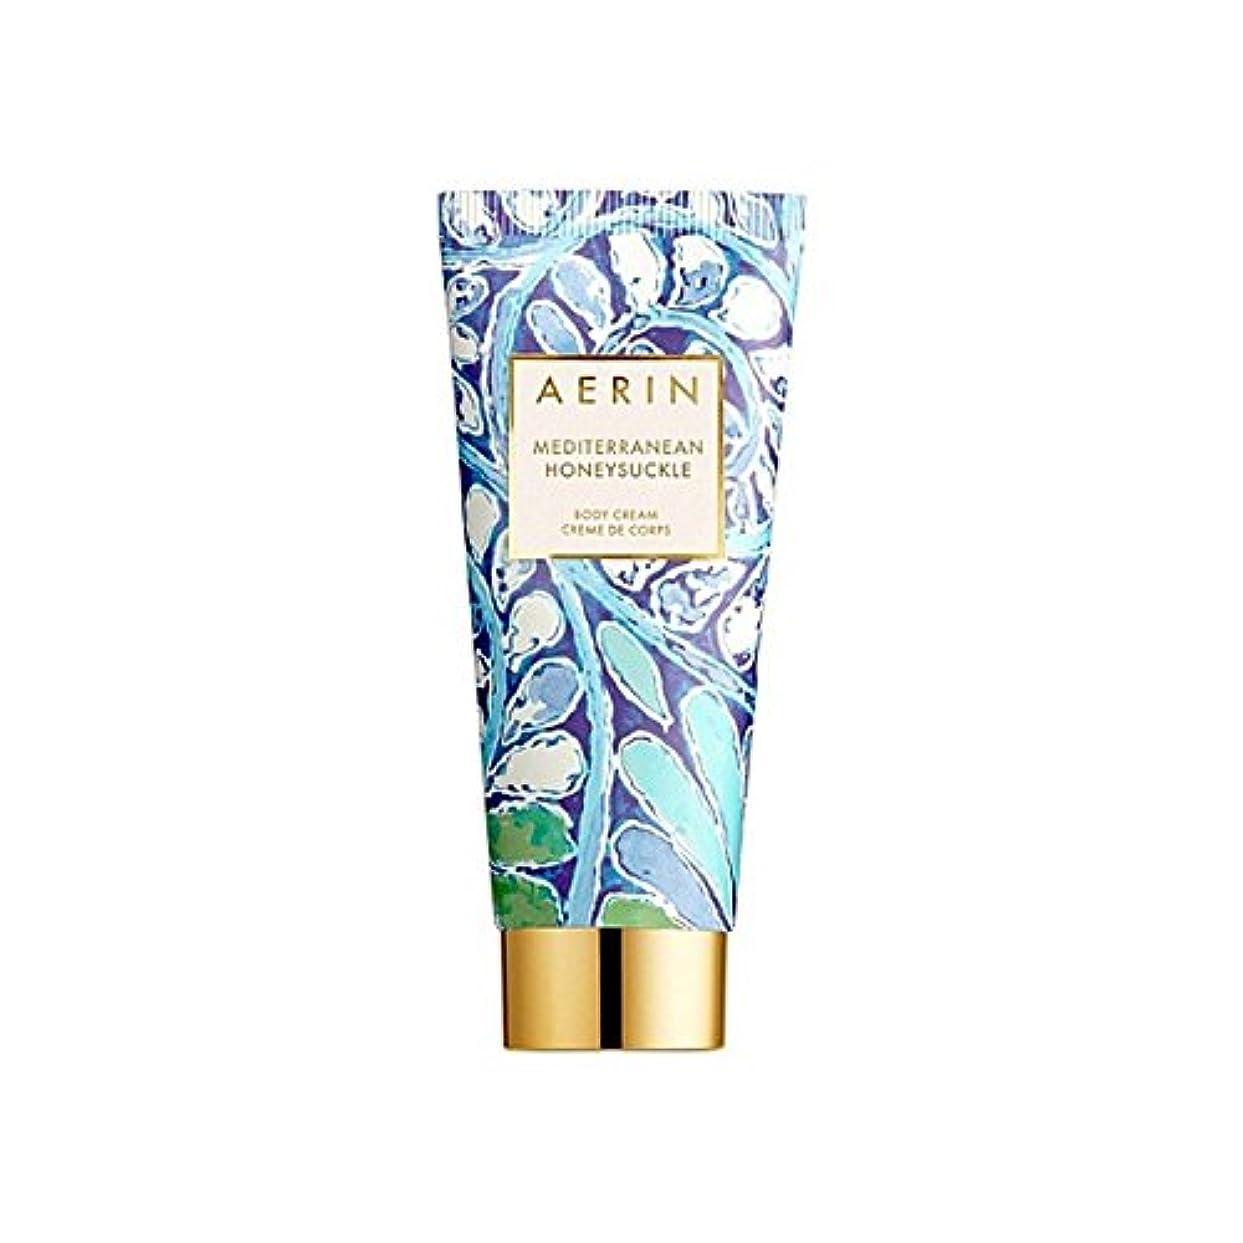 Aerin Mediterrenean Honeysuckle Body Cream 150ml (Pack of 6) - スイカズラボディクリーム150ミリリットル x6 [並行輸入品]